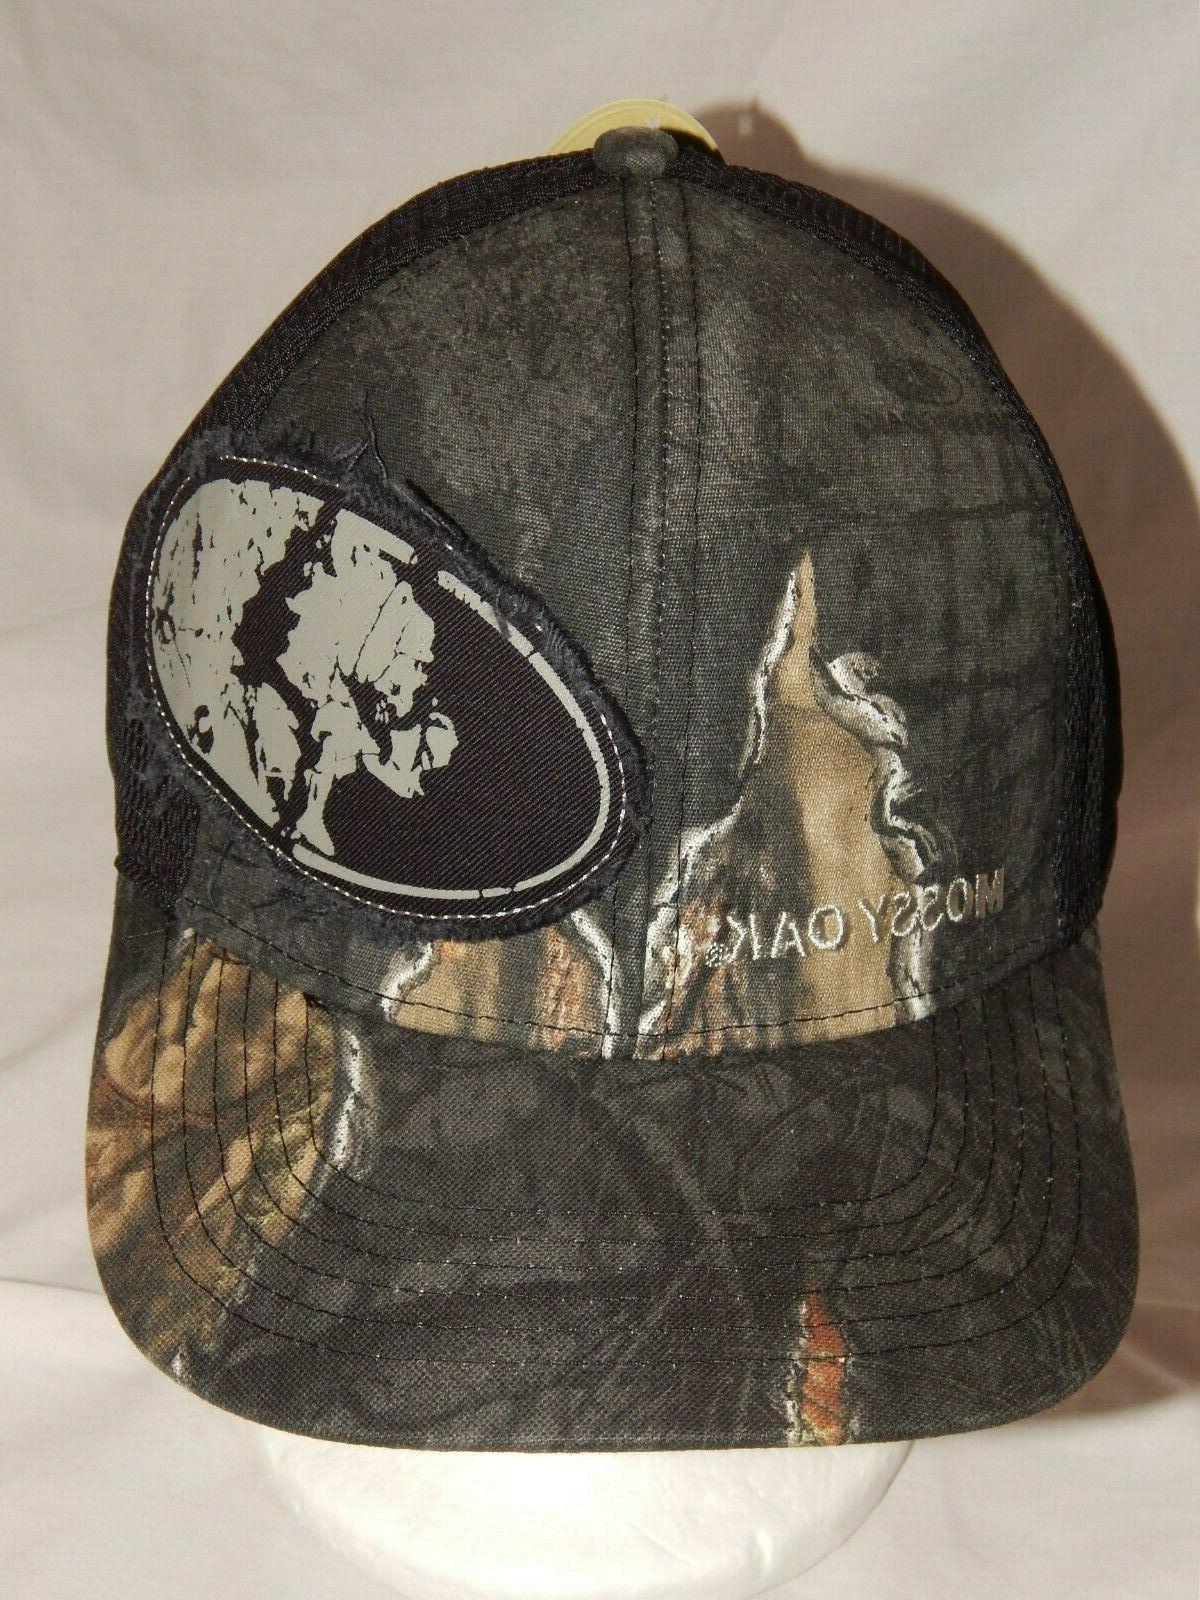 NEW Mossy Oak Hat Trucker Cap Dark Tree Camo Deer Hunting St